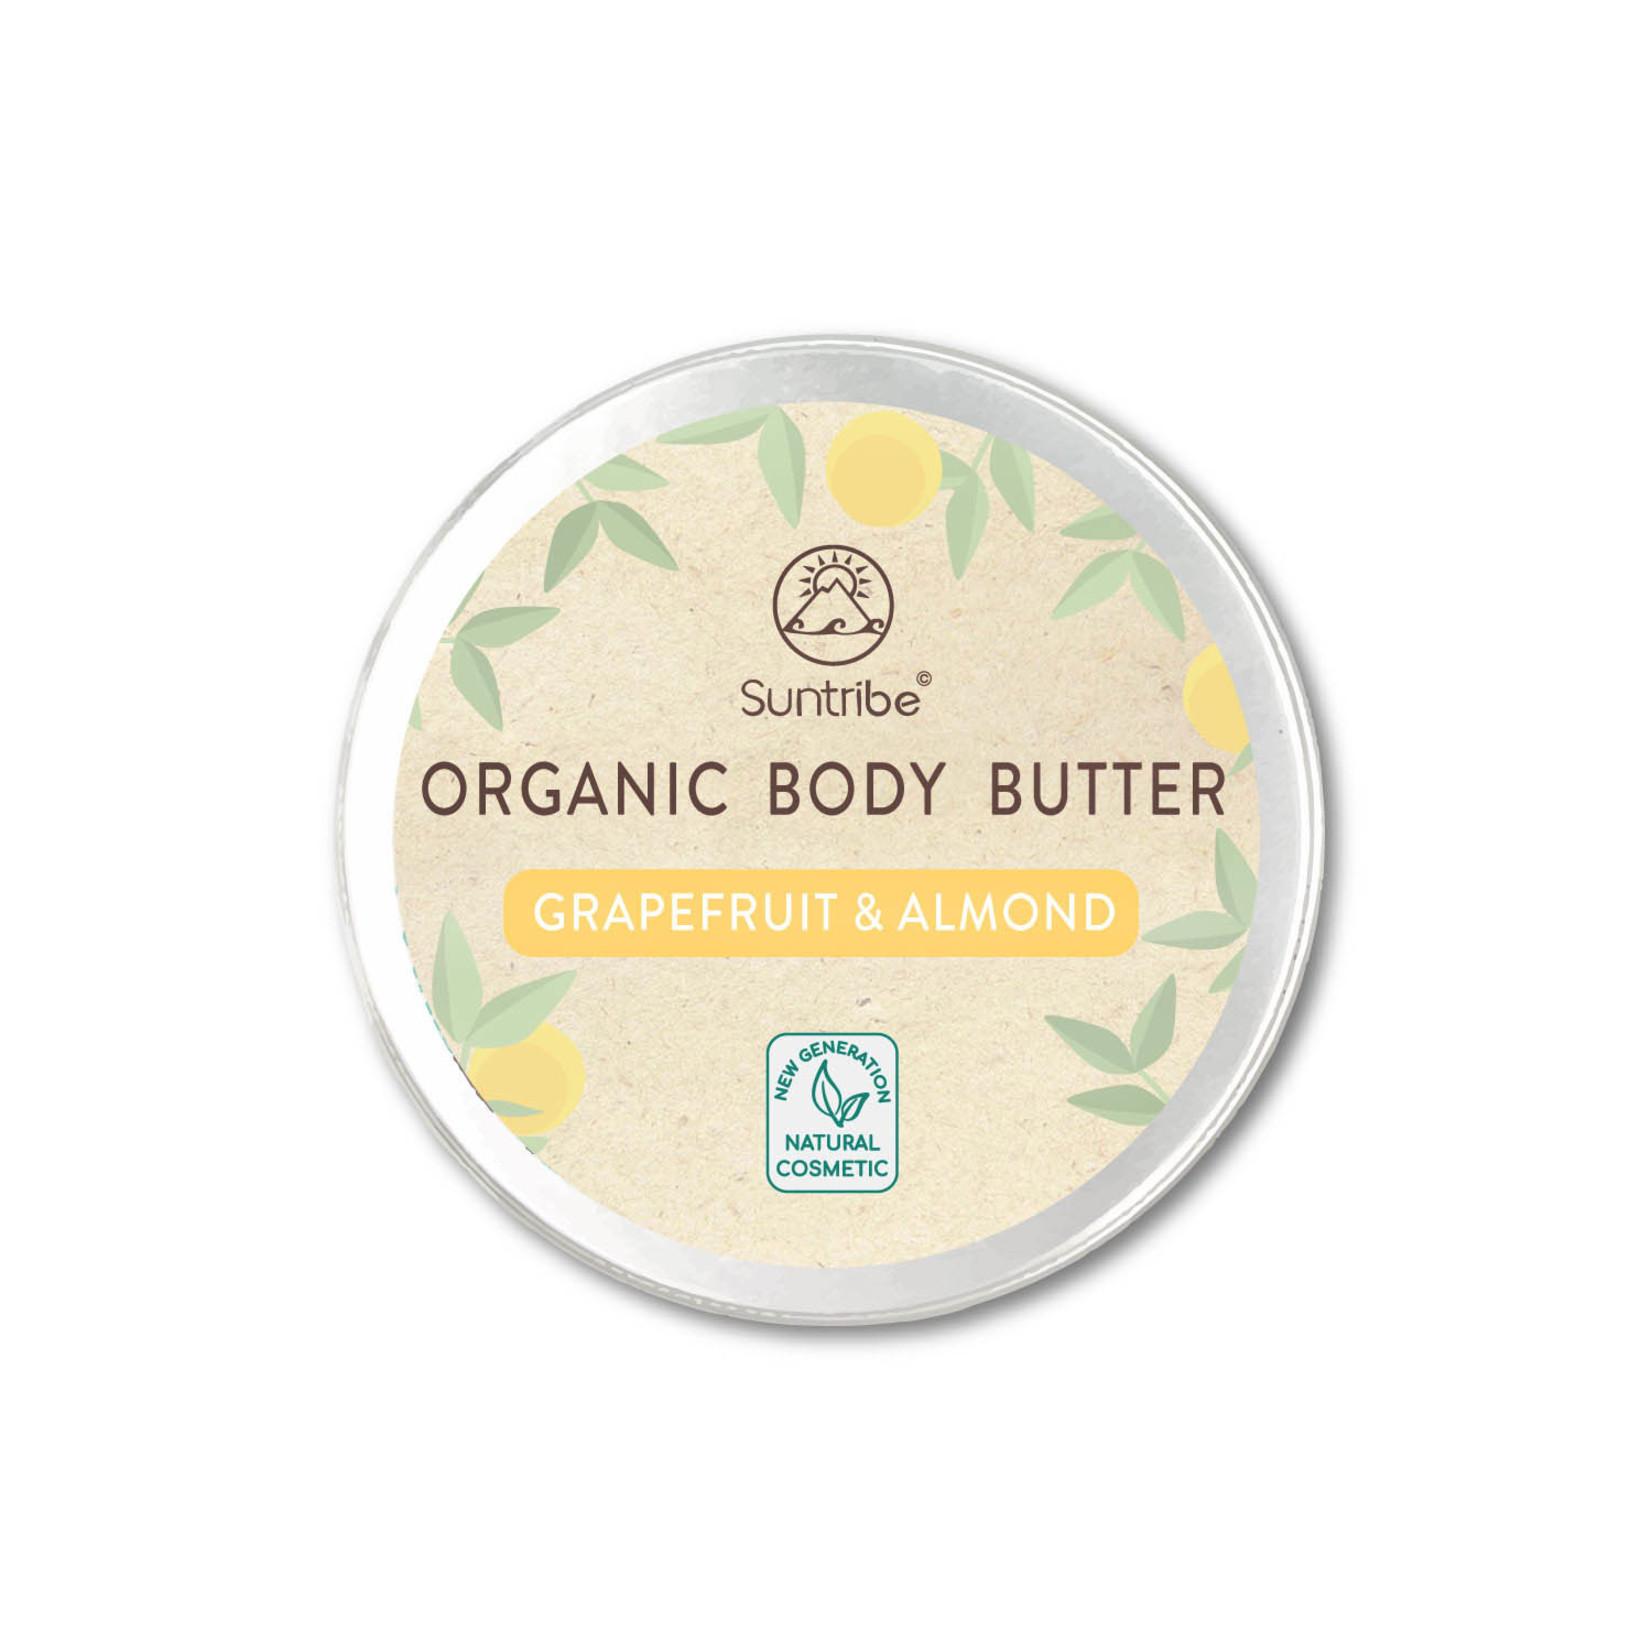 Suntribe Suntribe All Natural Body Butter - Grapefruit & Almond - 150ml